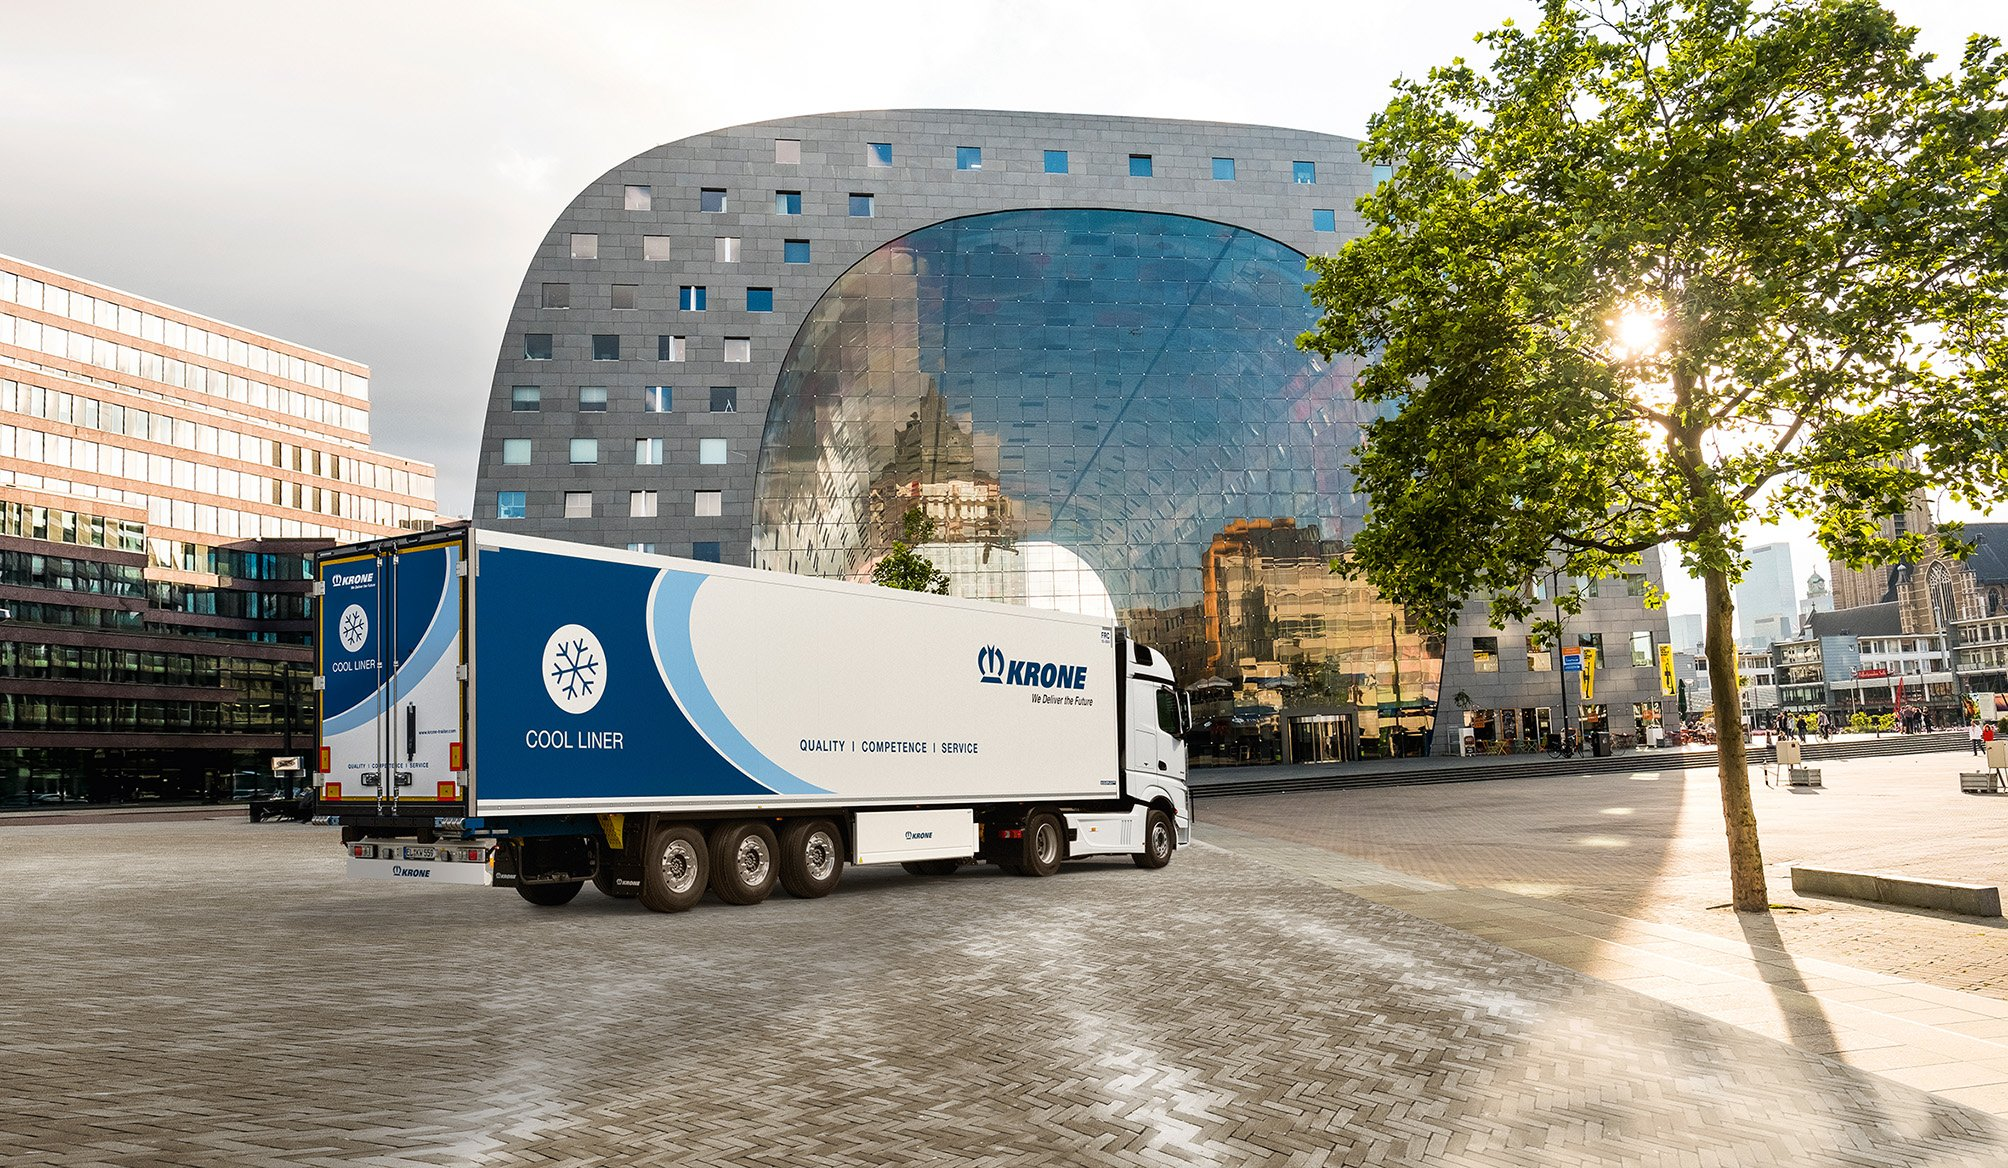 Годовой оборот Krone составил 1,9 млрд евро